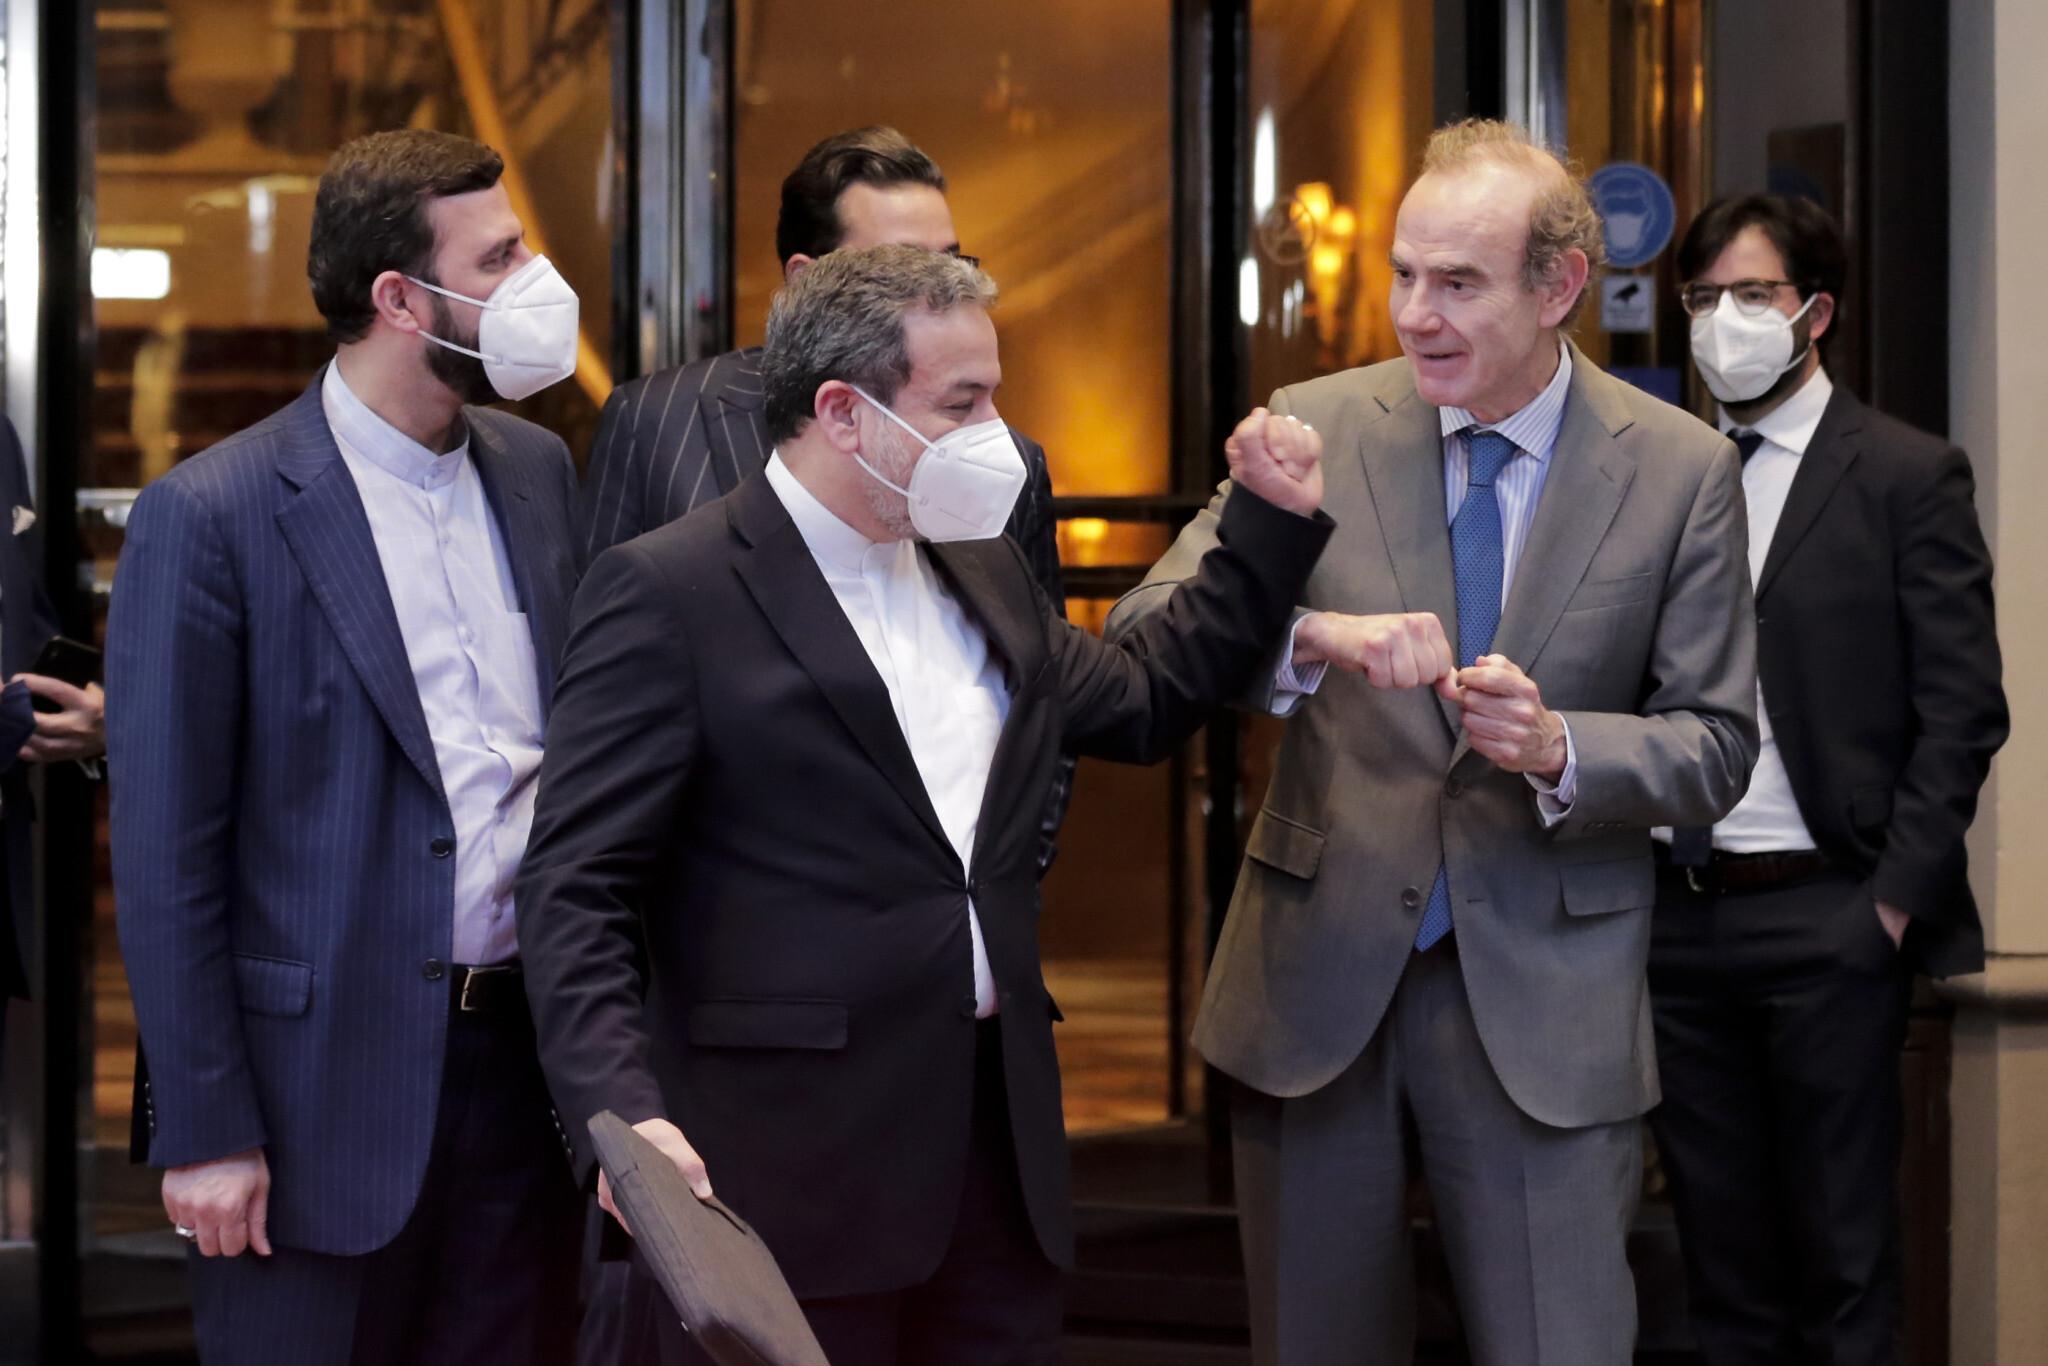 Iran nuclear talks in Vienna Abbas Araqchi & Enrique Mora